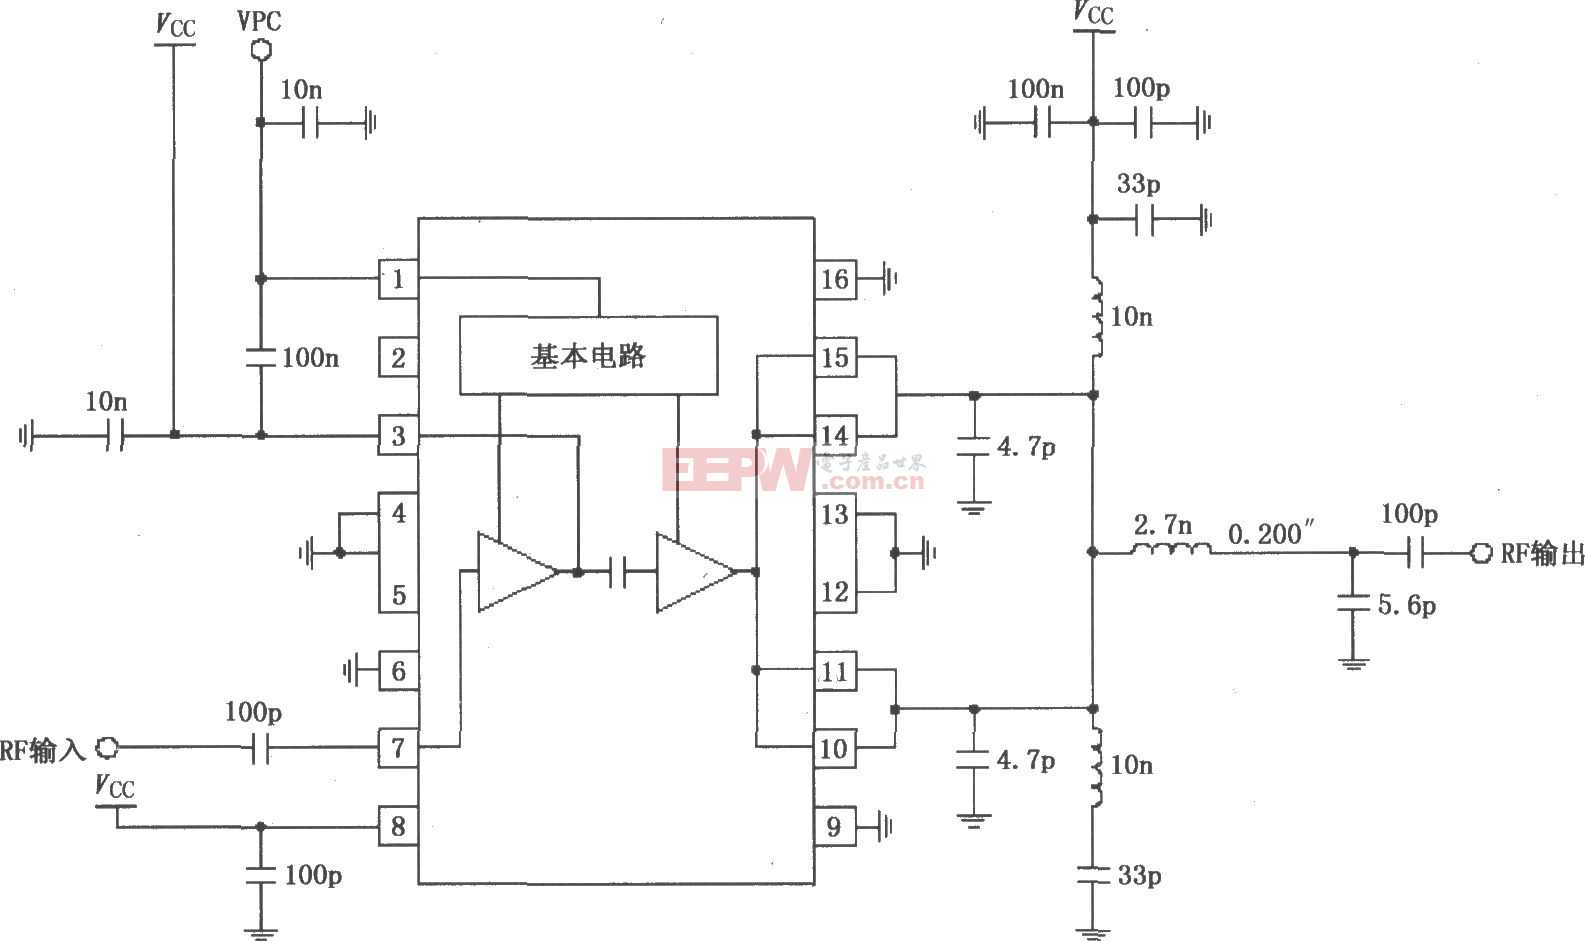 RF2131在4.8V电源供电时的最佳效率功率放大电路图